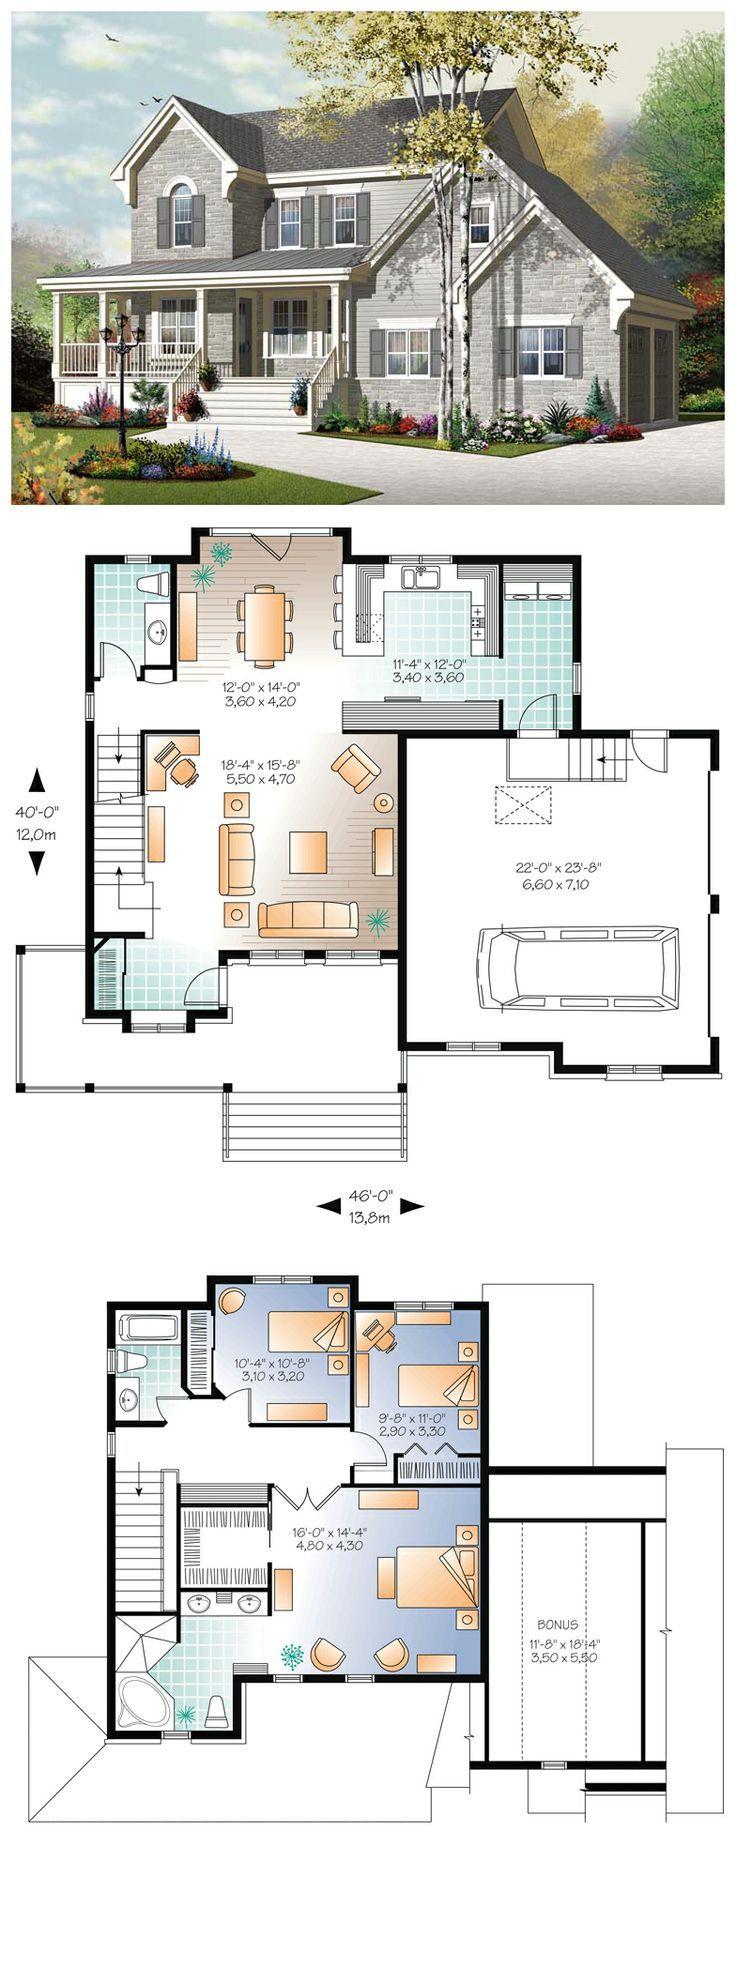 11 Best Bloxburg House Ideas Images On Pinterest House